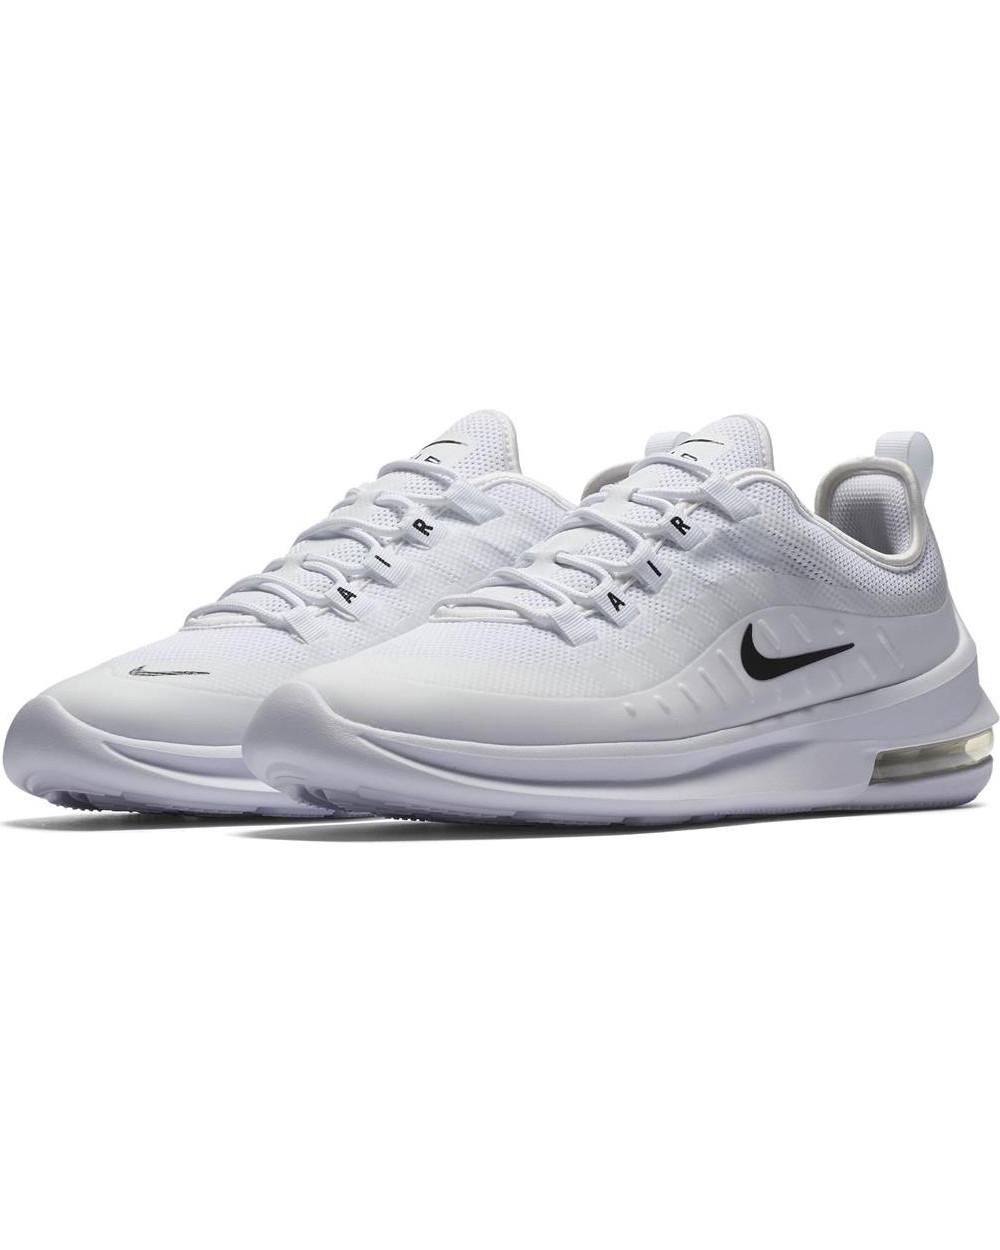 sale retailer f0e0b 63756 ... Nike Air Max AXIS AXIS AXIS Scarpe Sneakers Trainers Sportive running  Tennis Bianco 83d422 ...